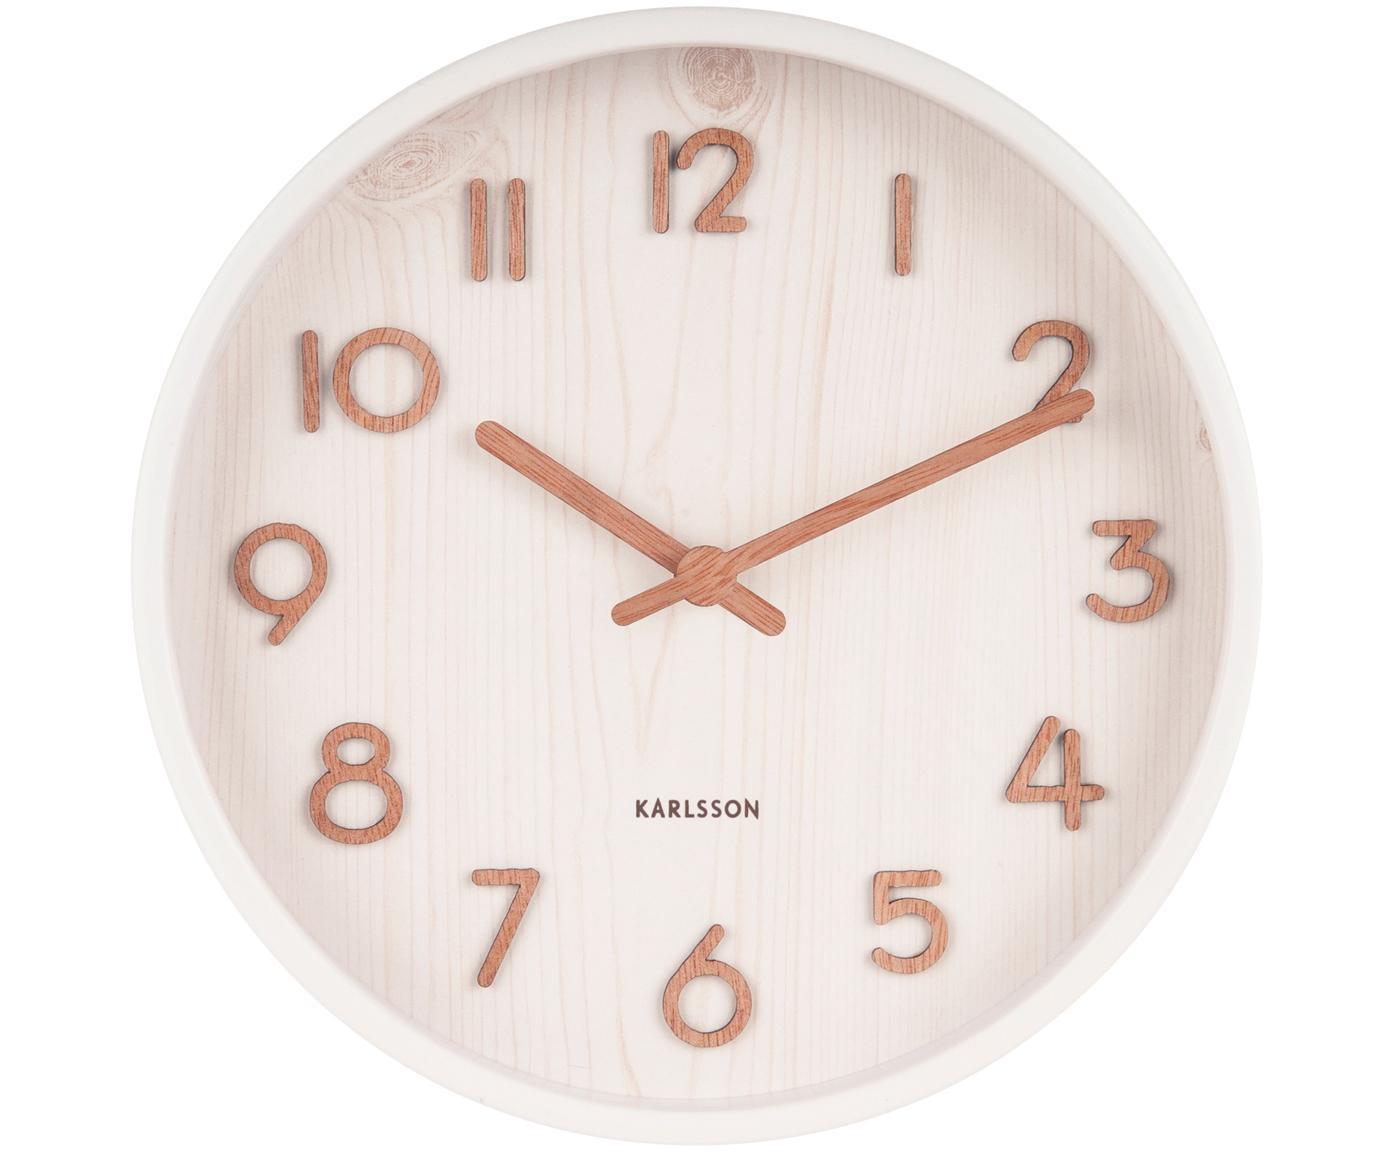 Orologio da parete Pure, Bianco, Ø 22 x Prof. 5 cm